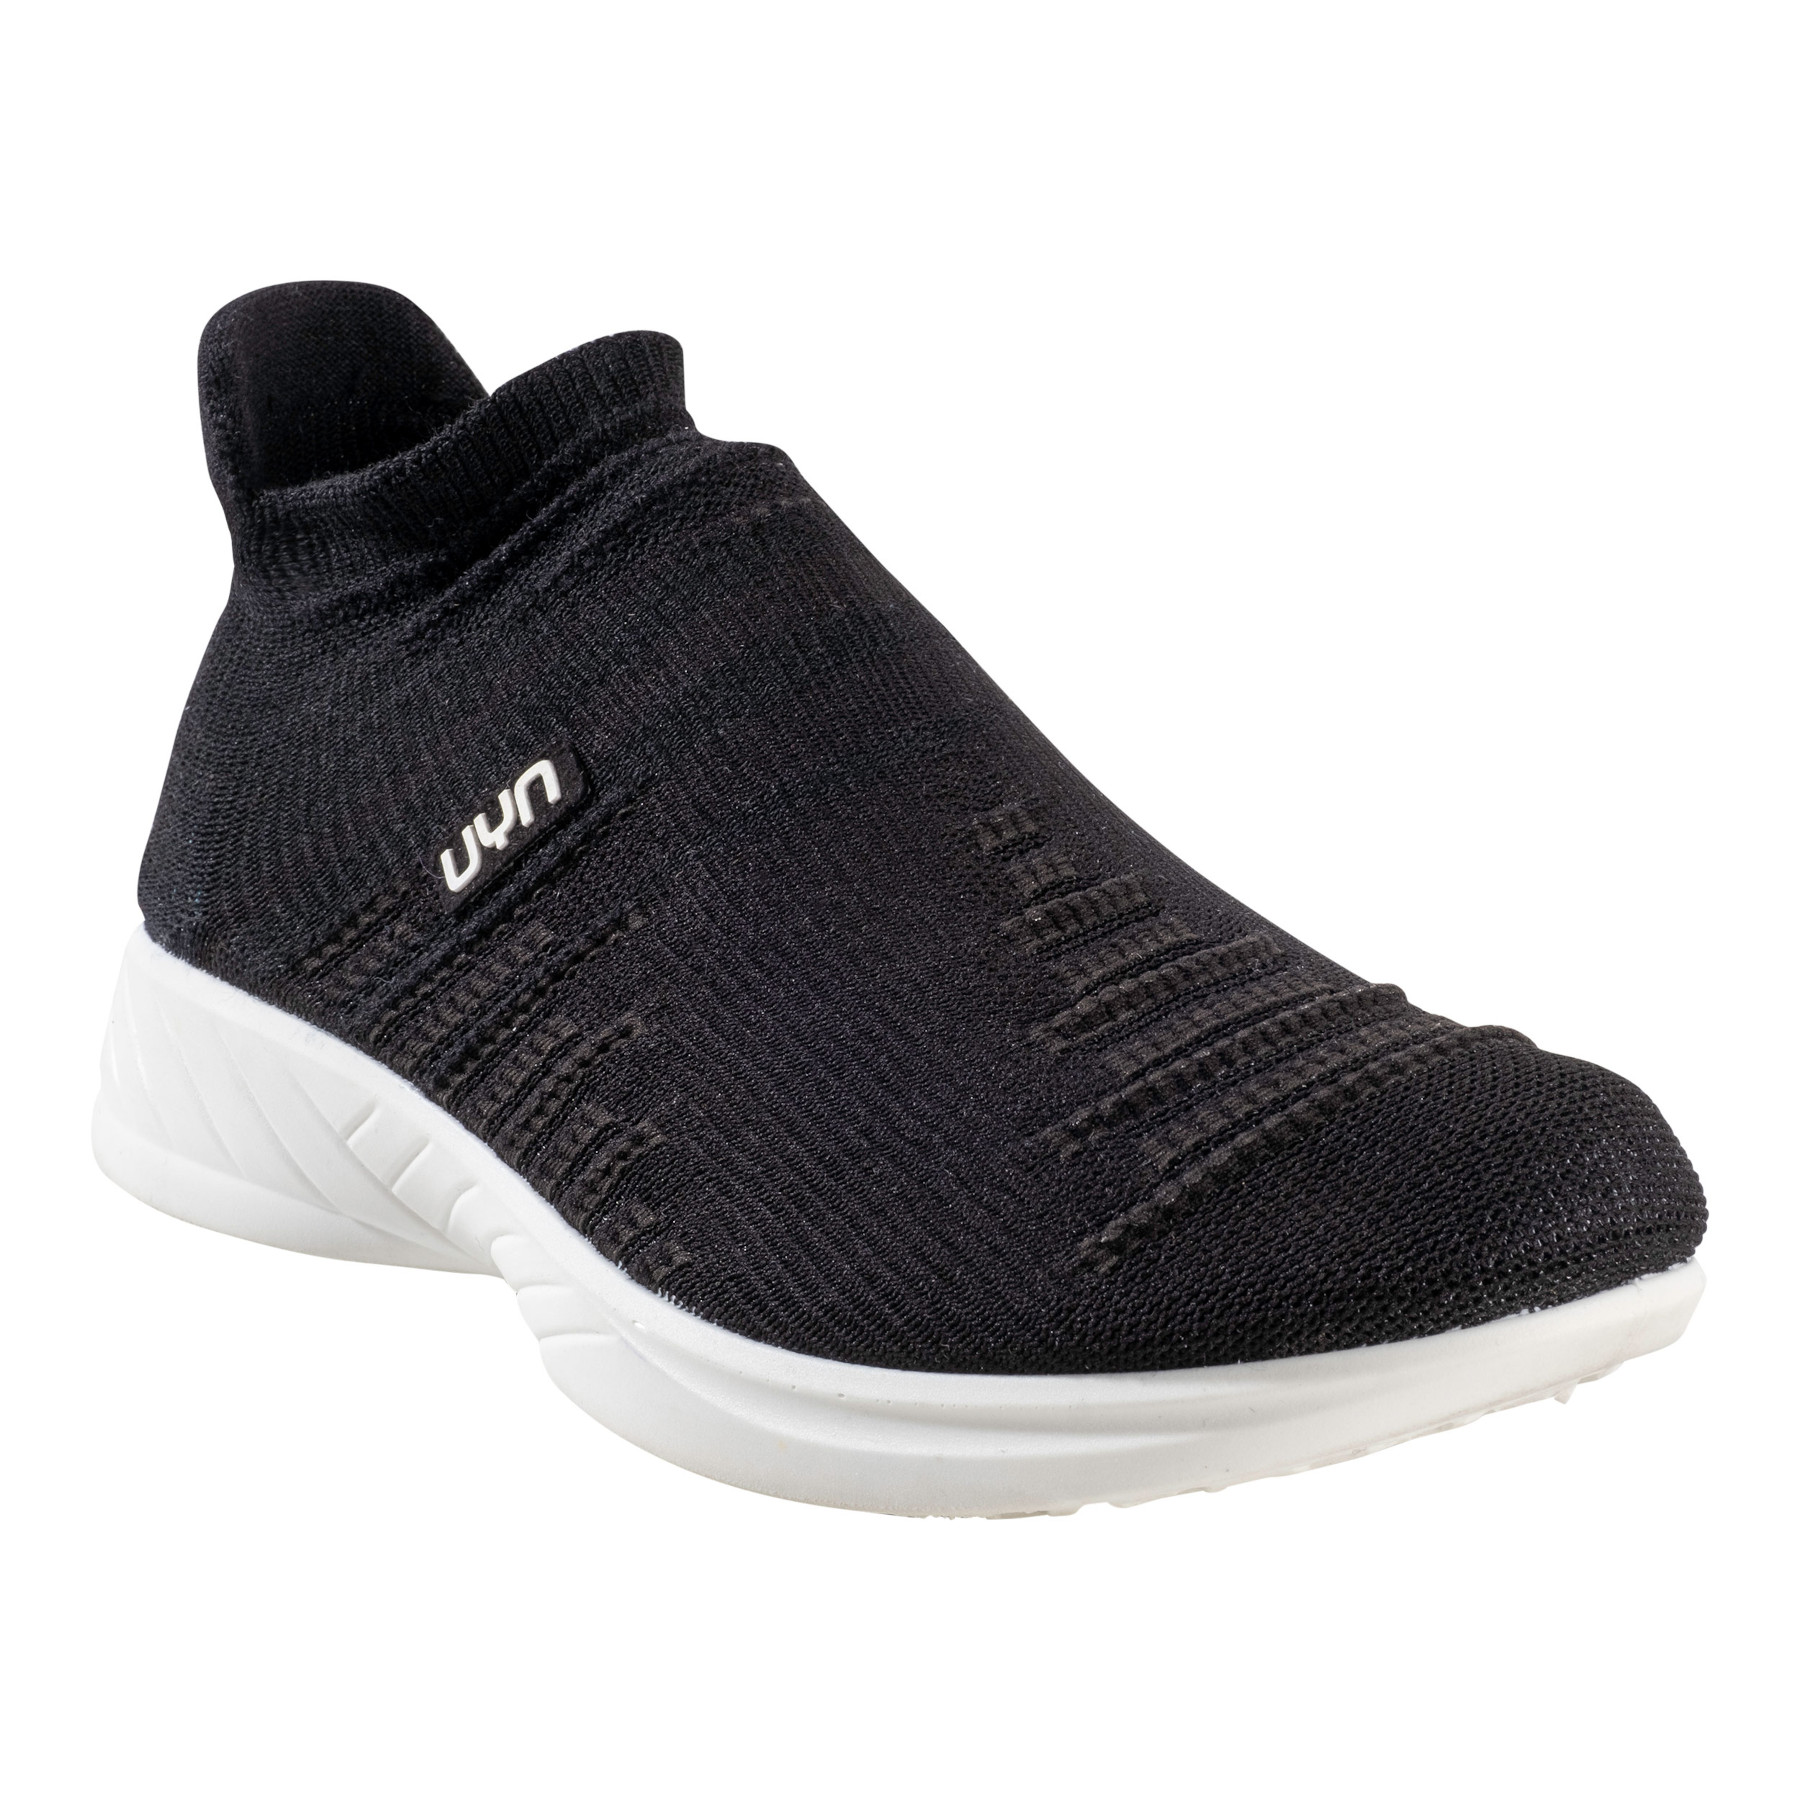 UYN X-Cross Lady Running Shoes - Optical Black/Black